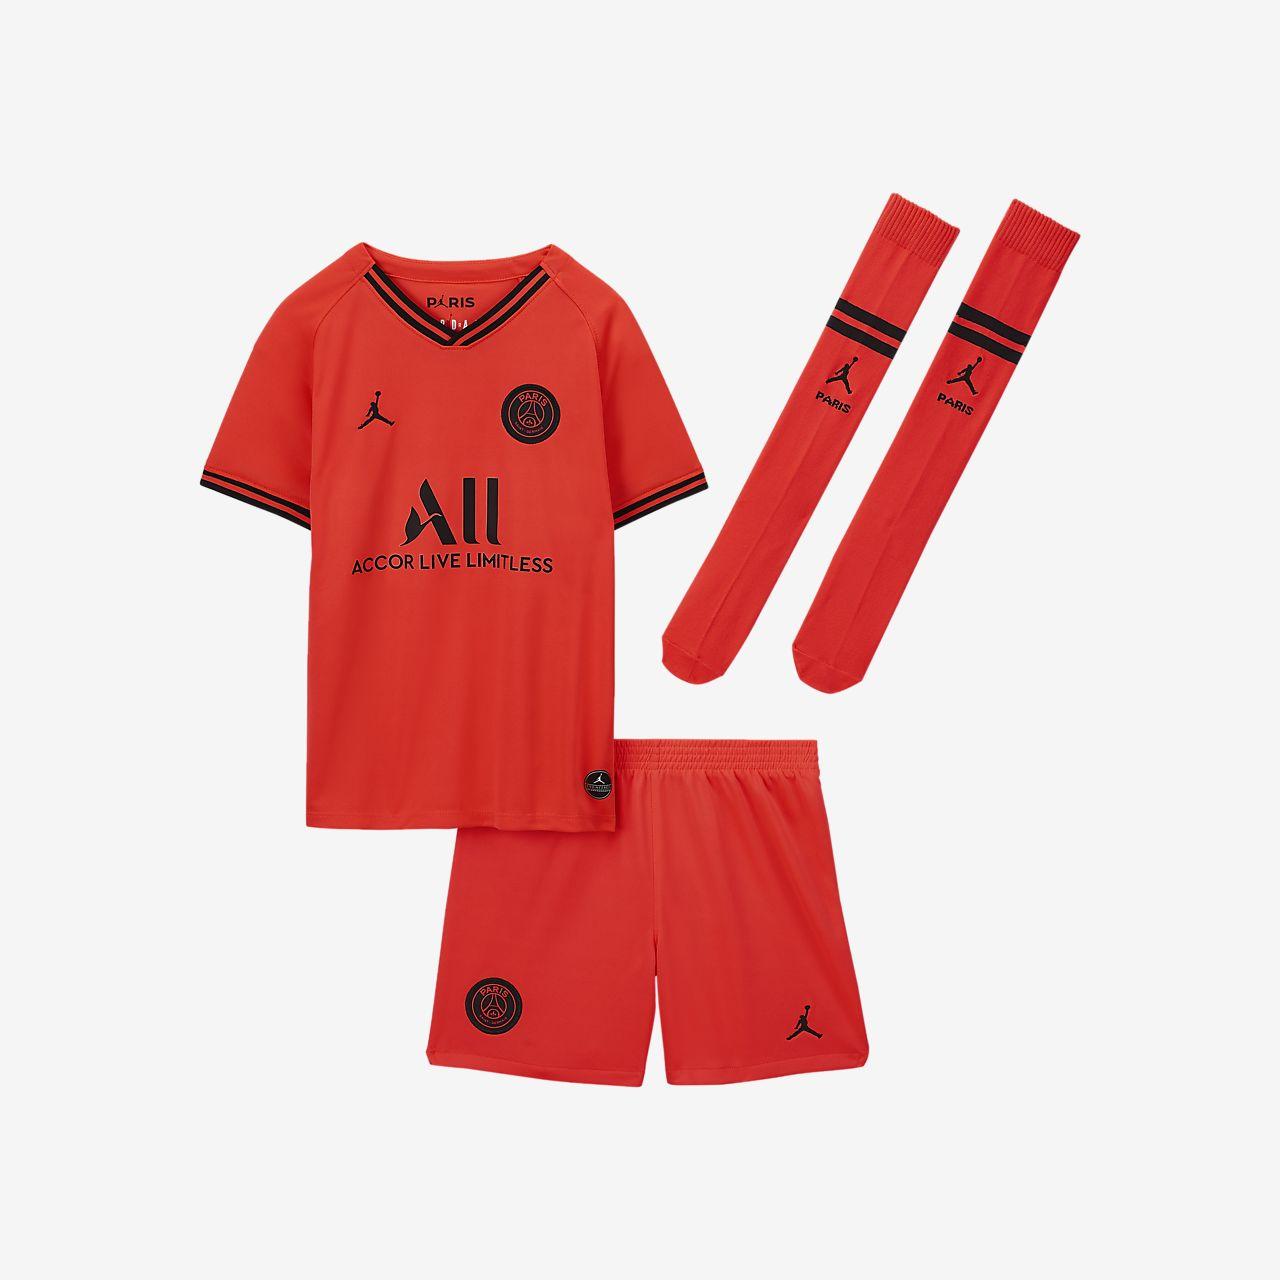 Jordan x Paris Saint-Germain 2019/20 Away Little Kids' Kit